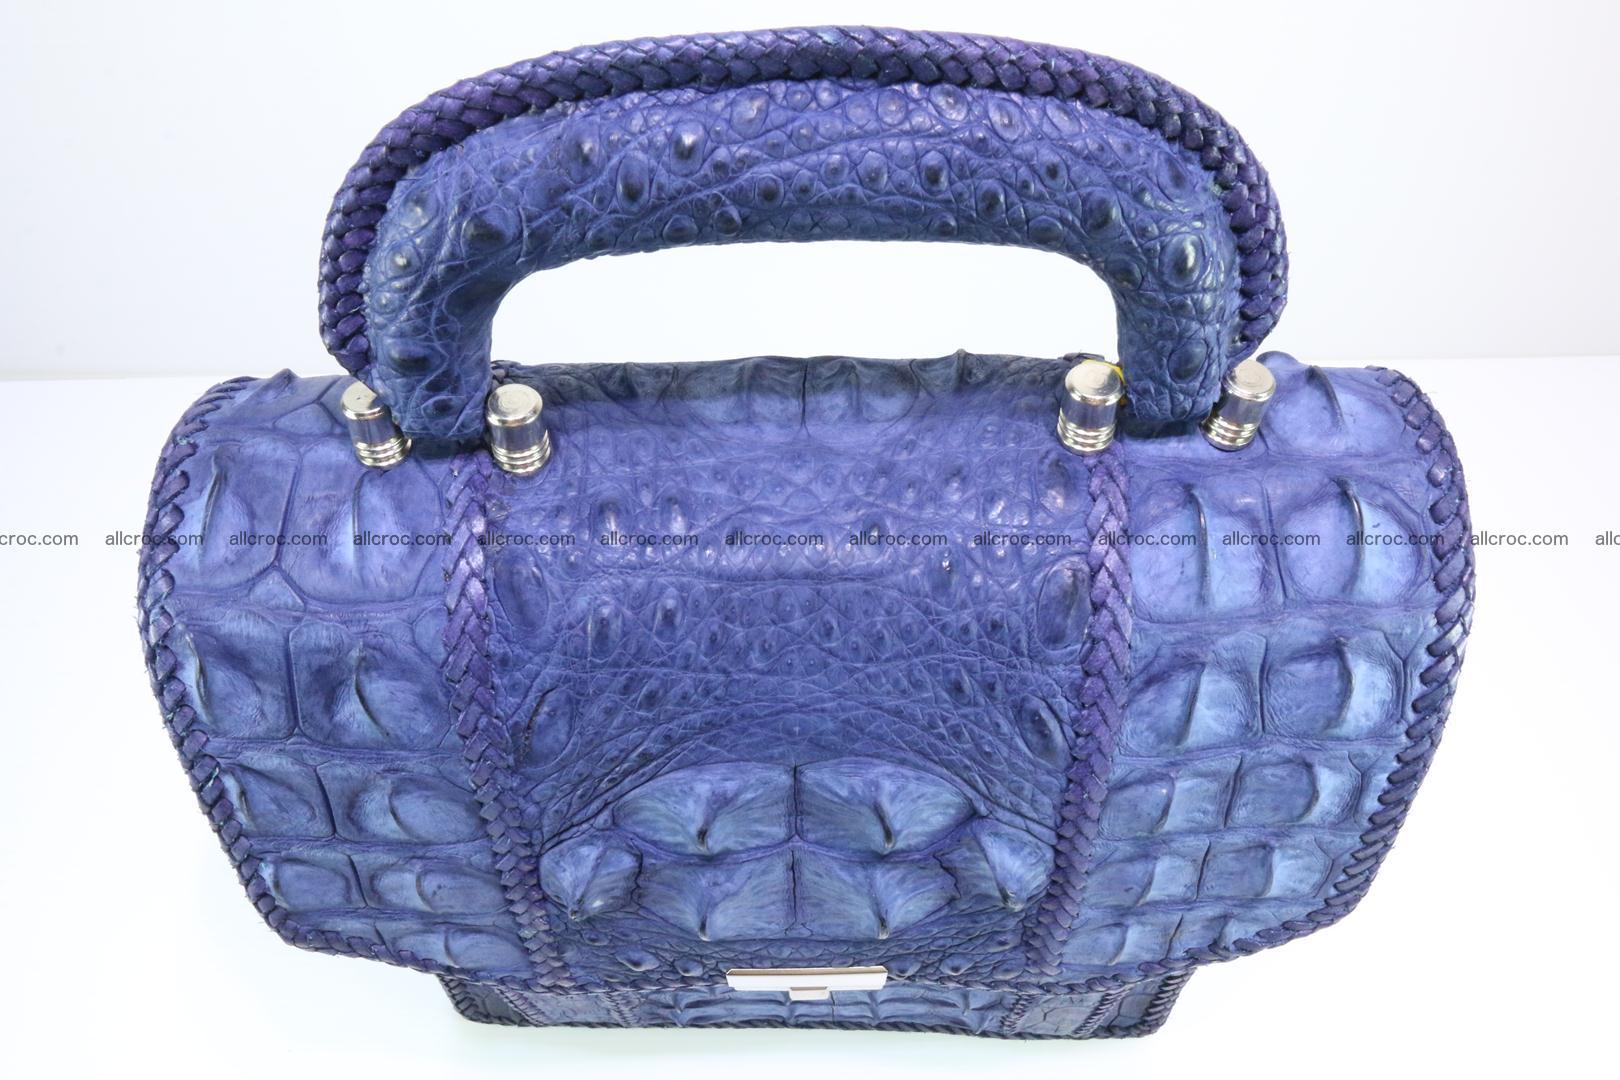 Crocodile skin messenger bag braided edges 422 Foto 8